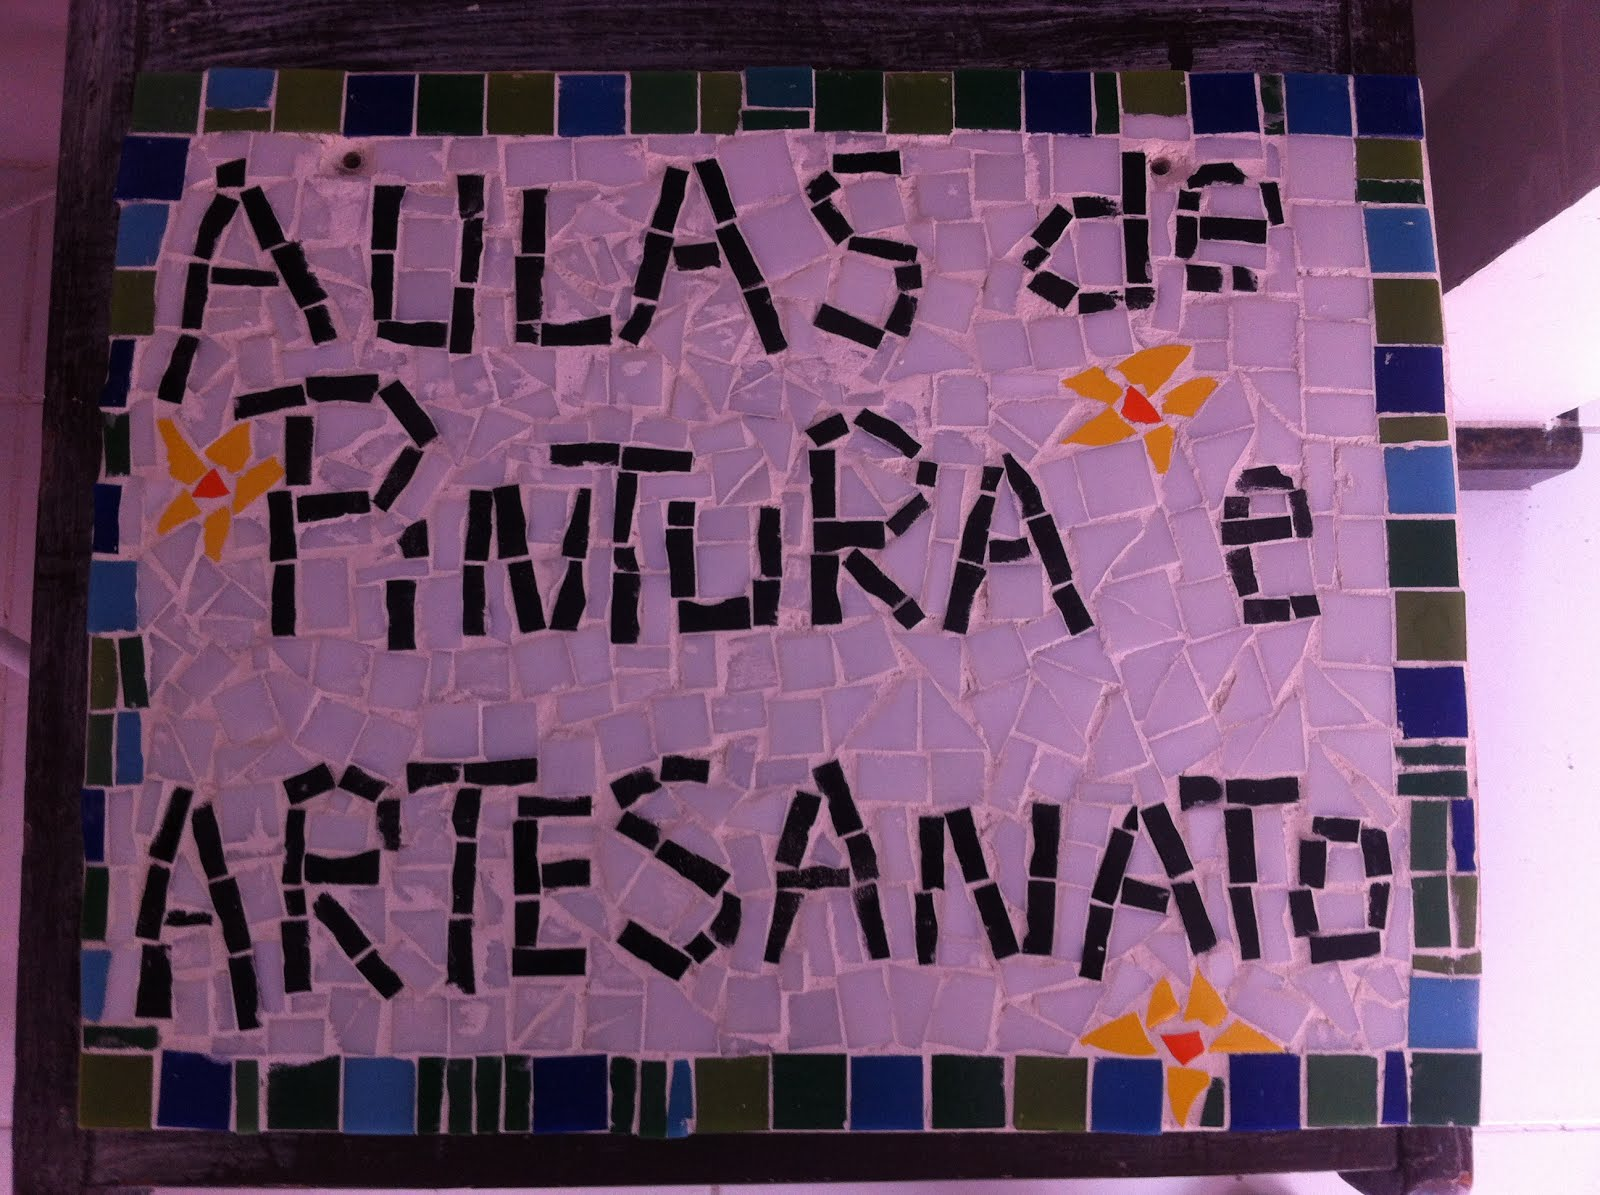 Mosaico, biscuit,pintura em tela , decoupage, pátina, Mdf